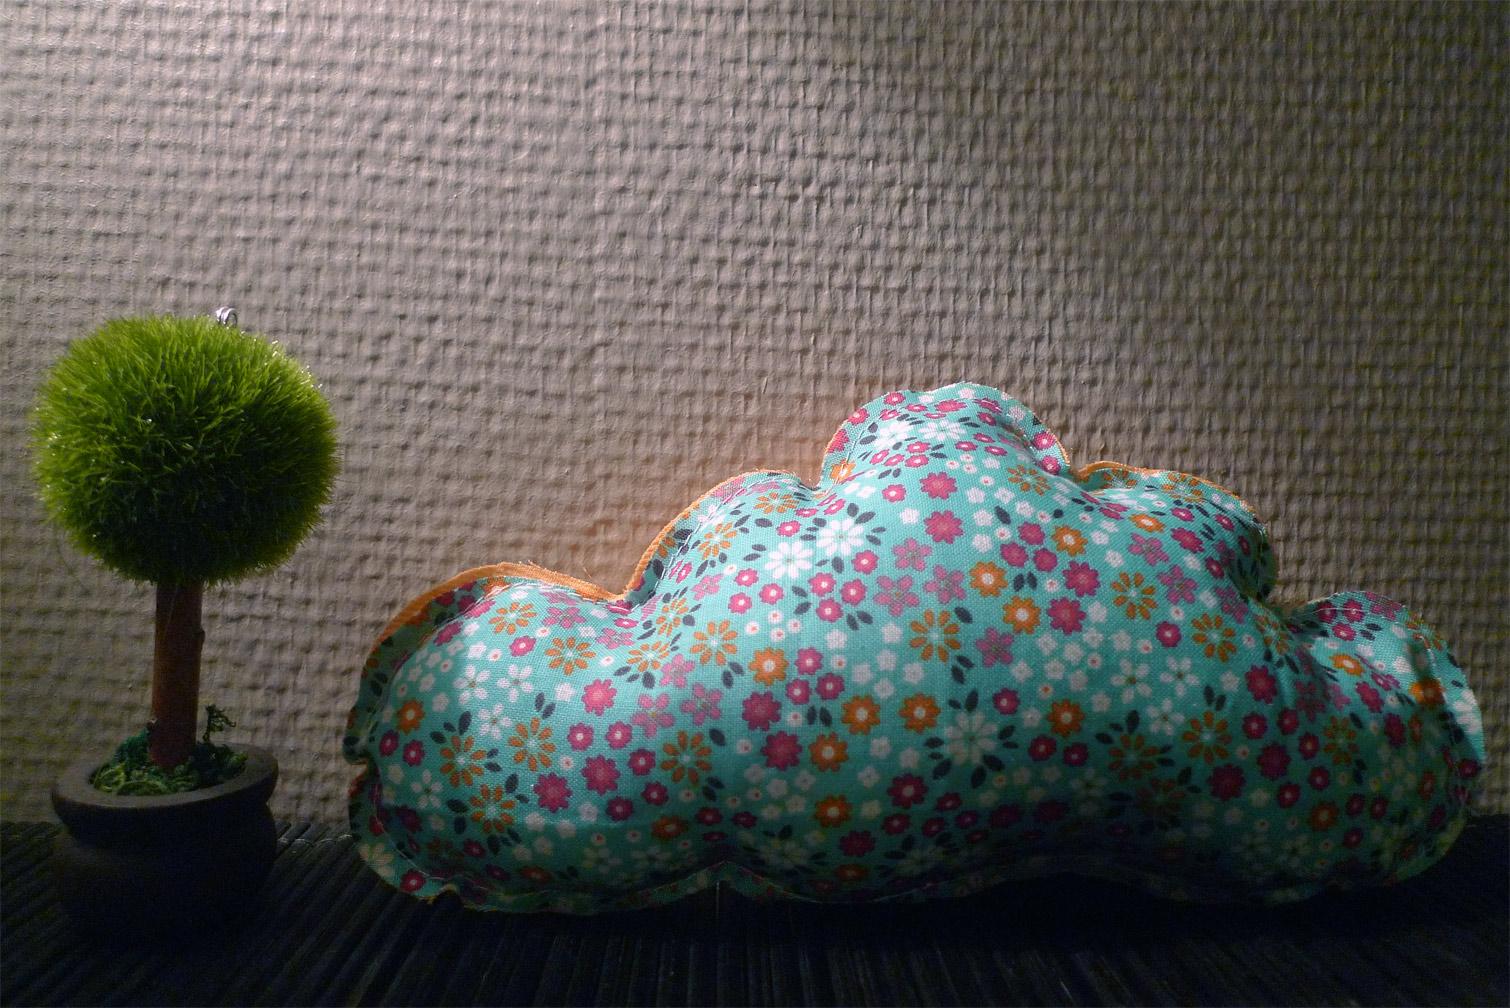 coussin nuage liberty vert d 39 eau fafaille studio. Black Bedroom Furniture Sets. Home Design Ideas